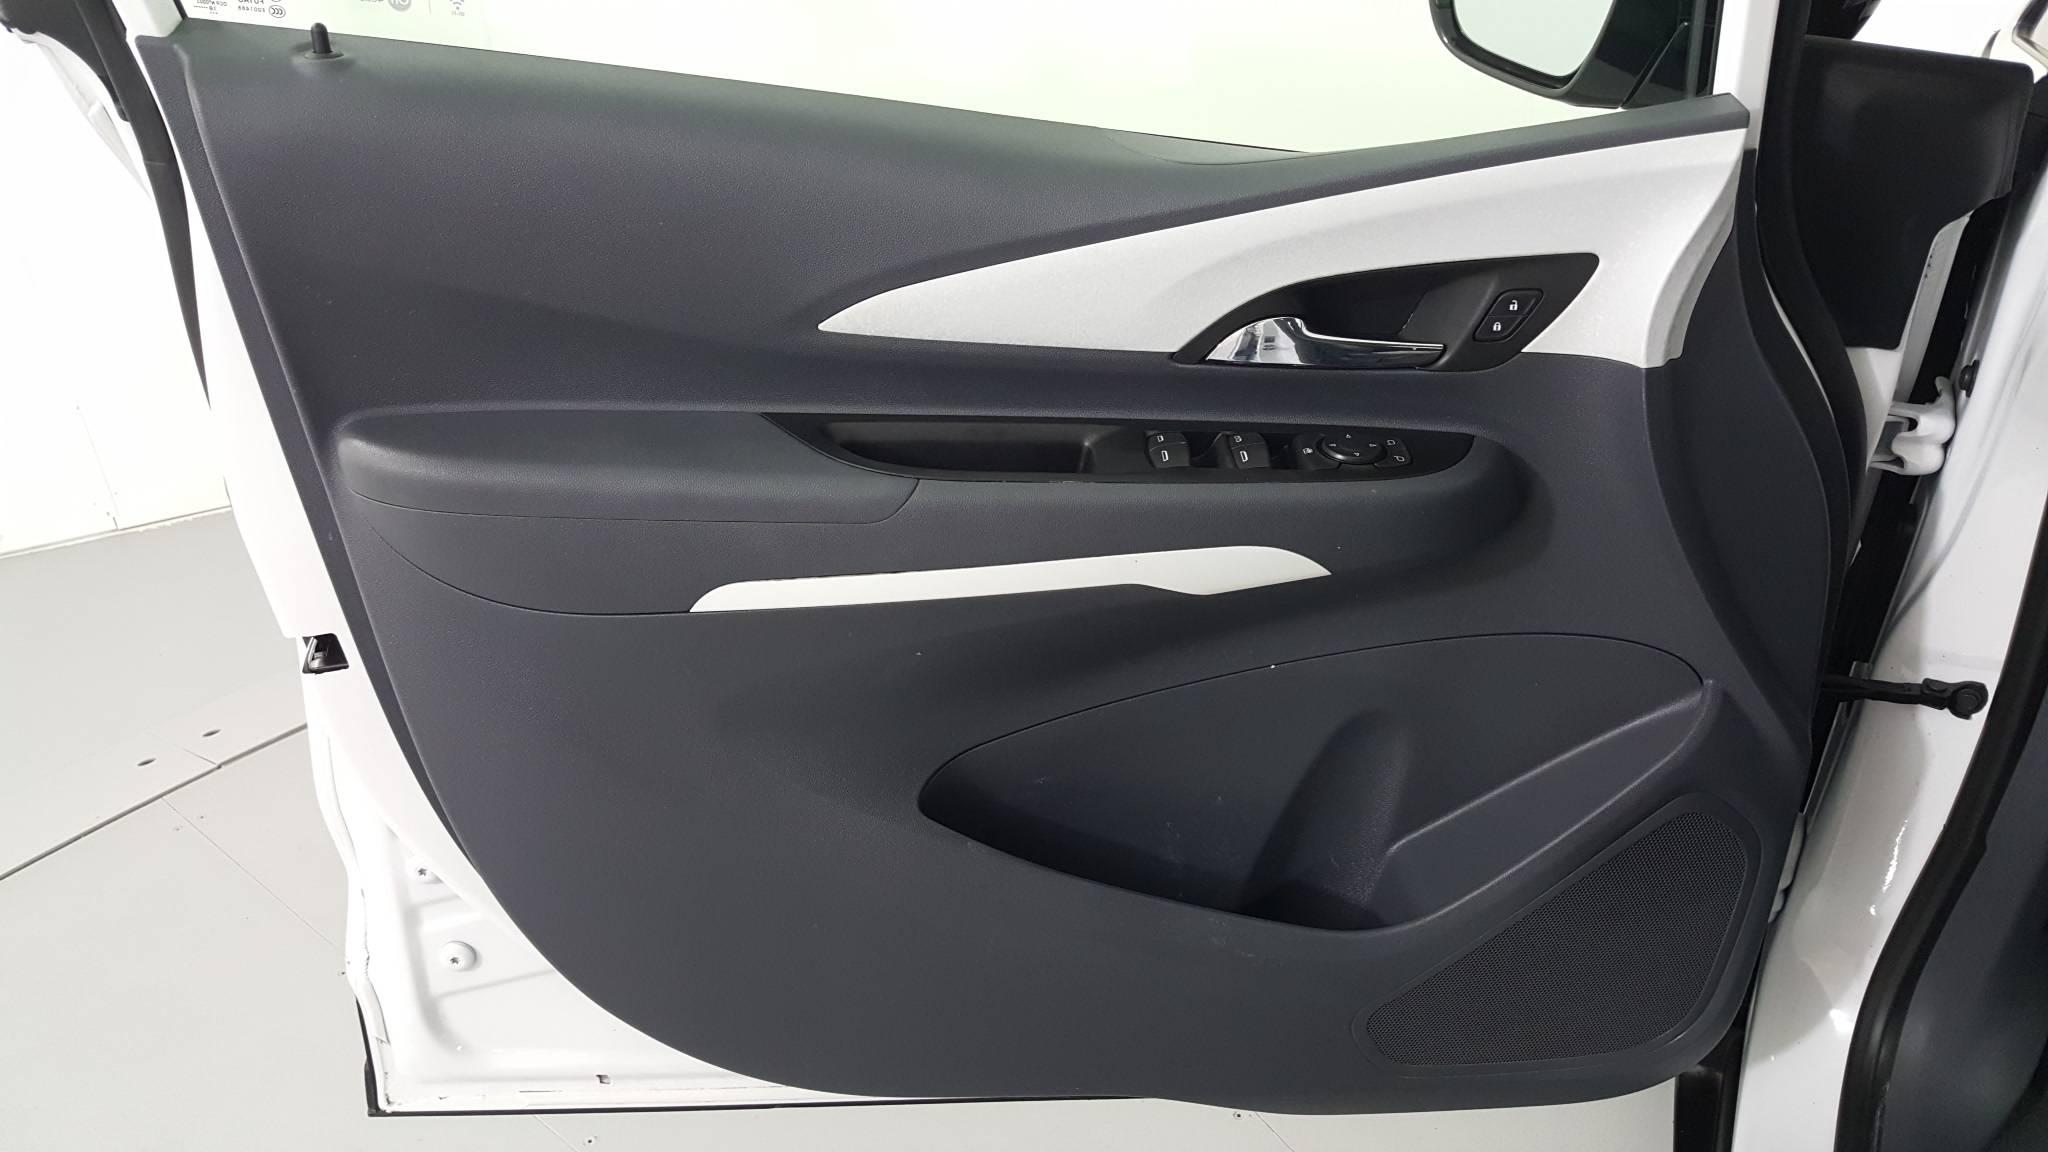 Pre-Owned 2019 Chevrolet Bolt EV LT